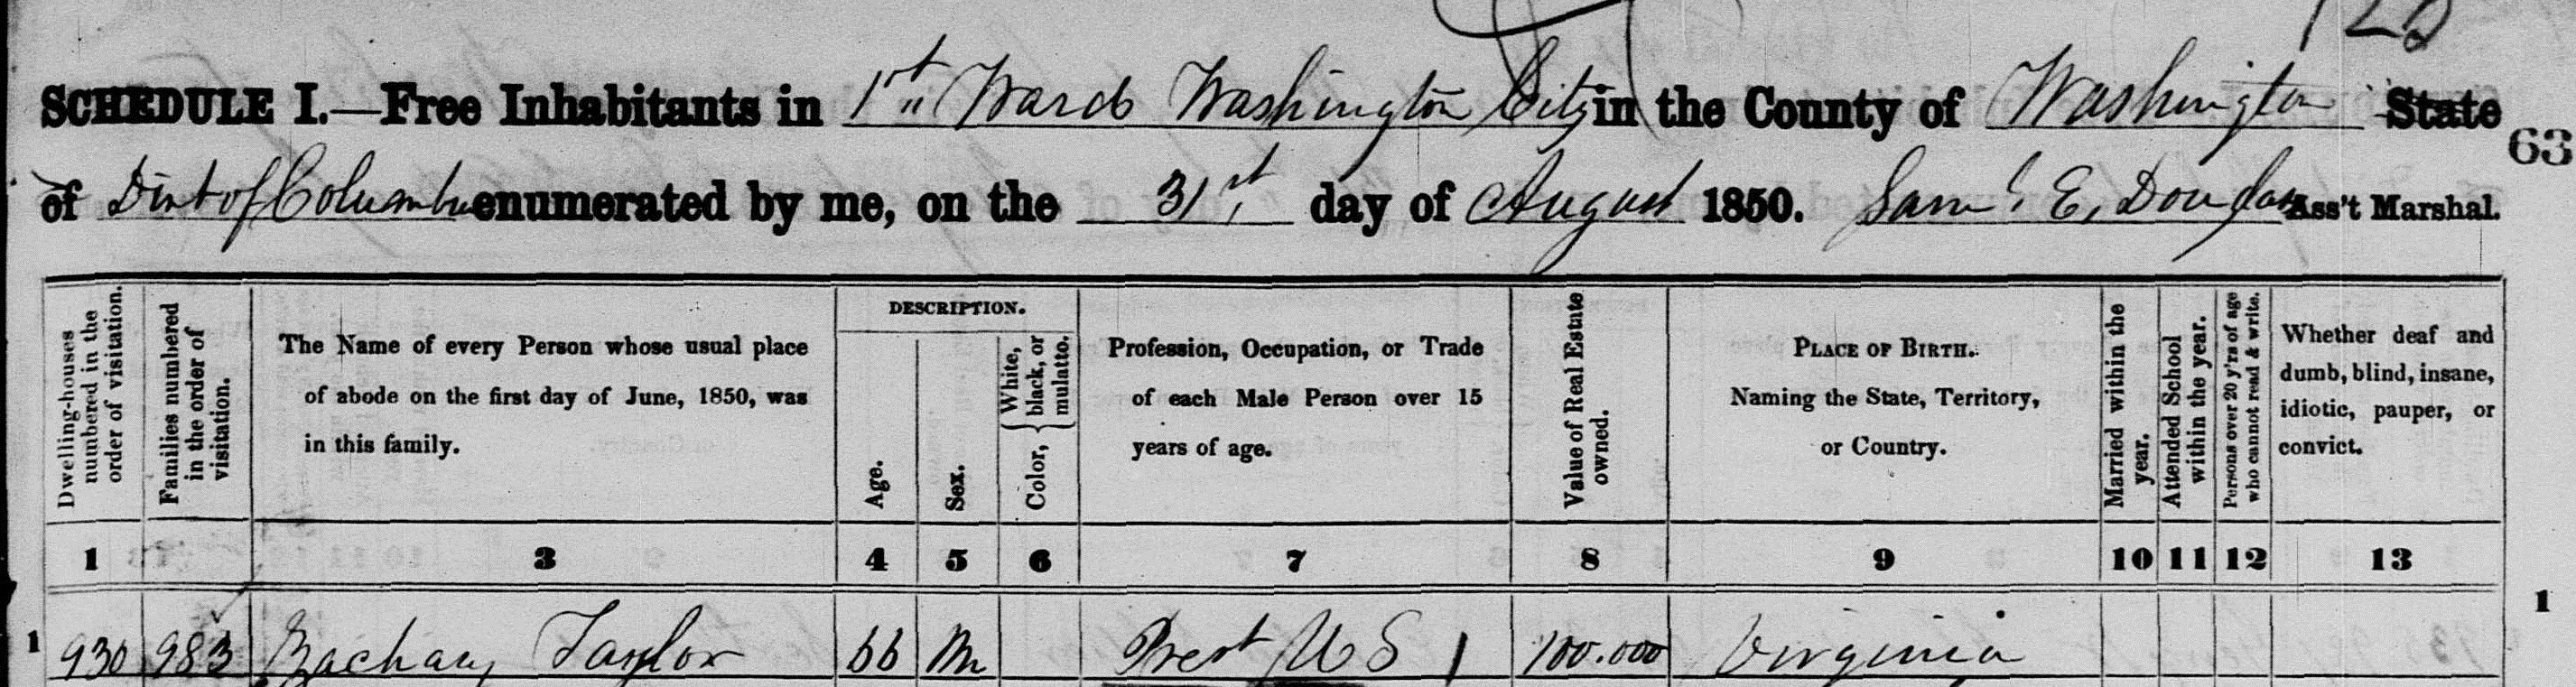 census-president-zachary-taylor-1850.jpg